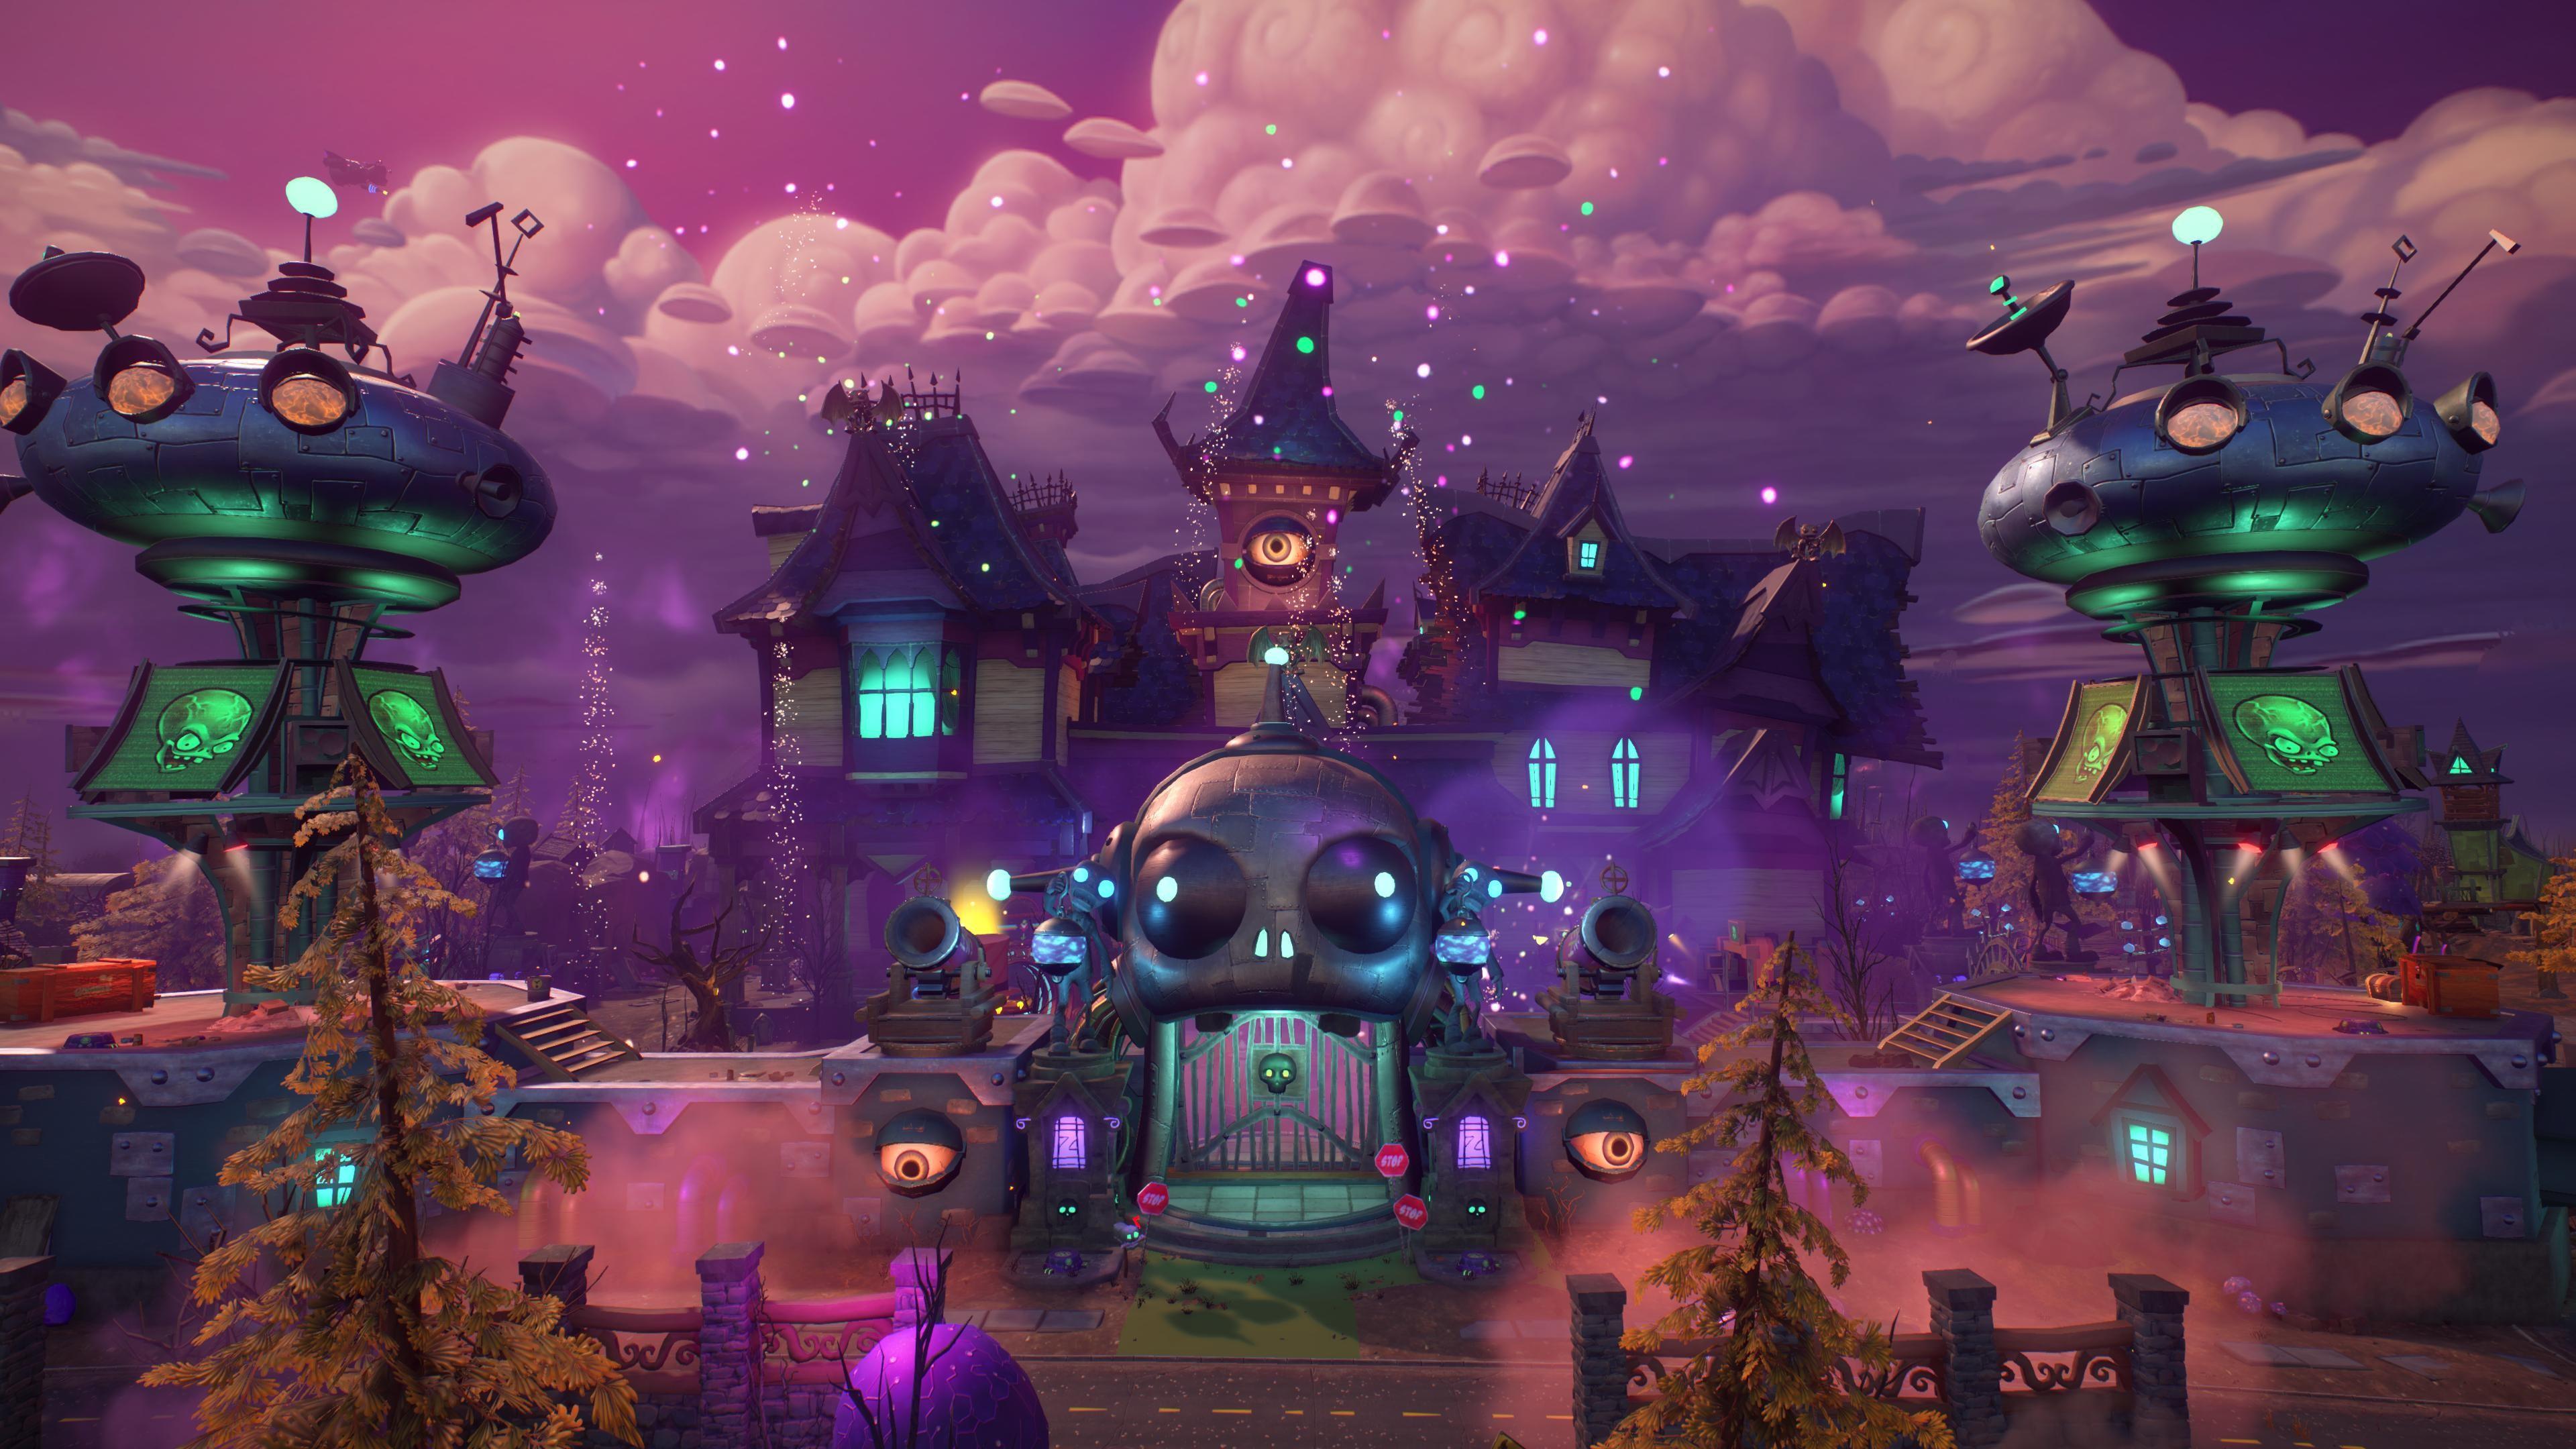 Wallpaper Plants Vs Zombies Garden Warfare 2 Shooter Best Games Pc Ps4 Xbox One Games 9556